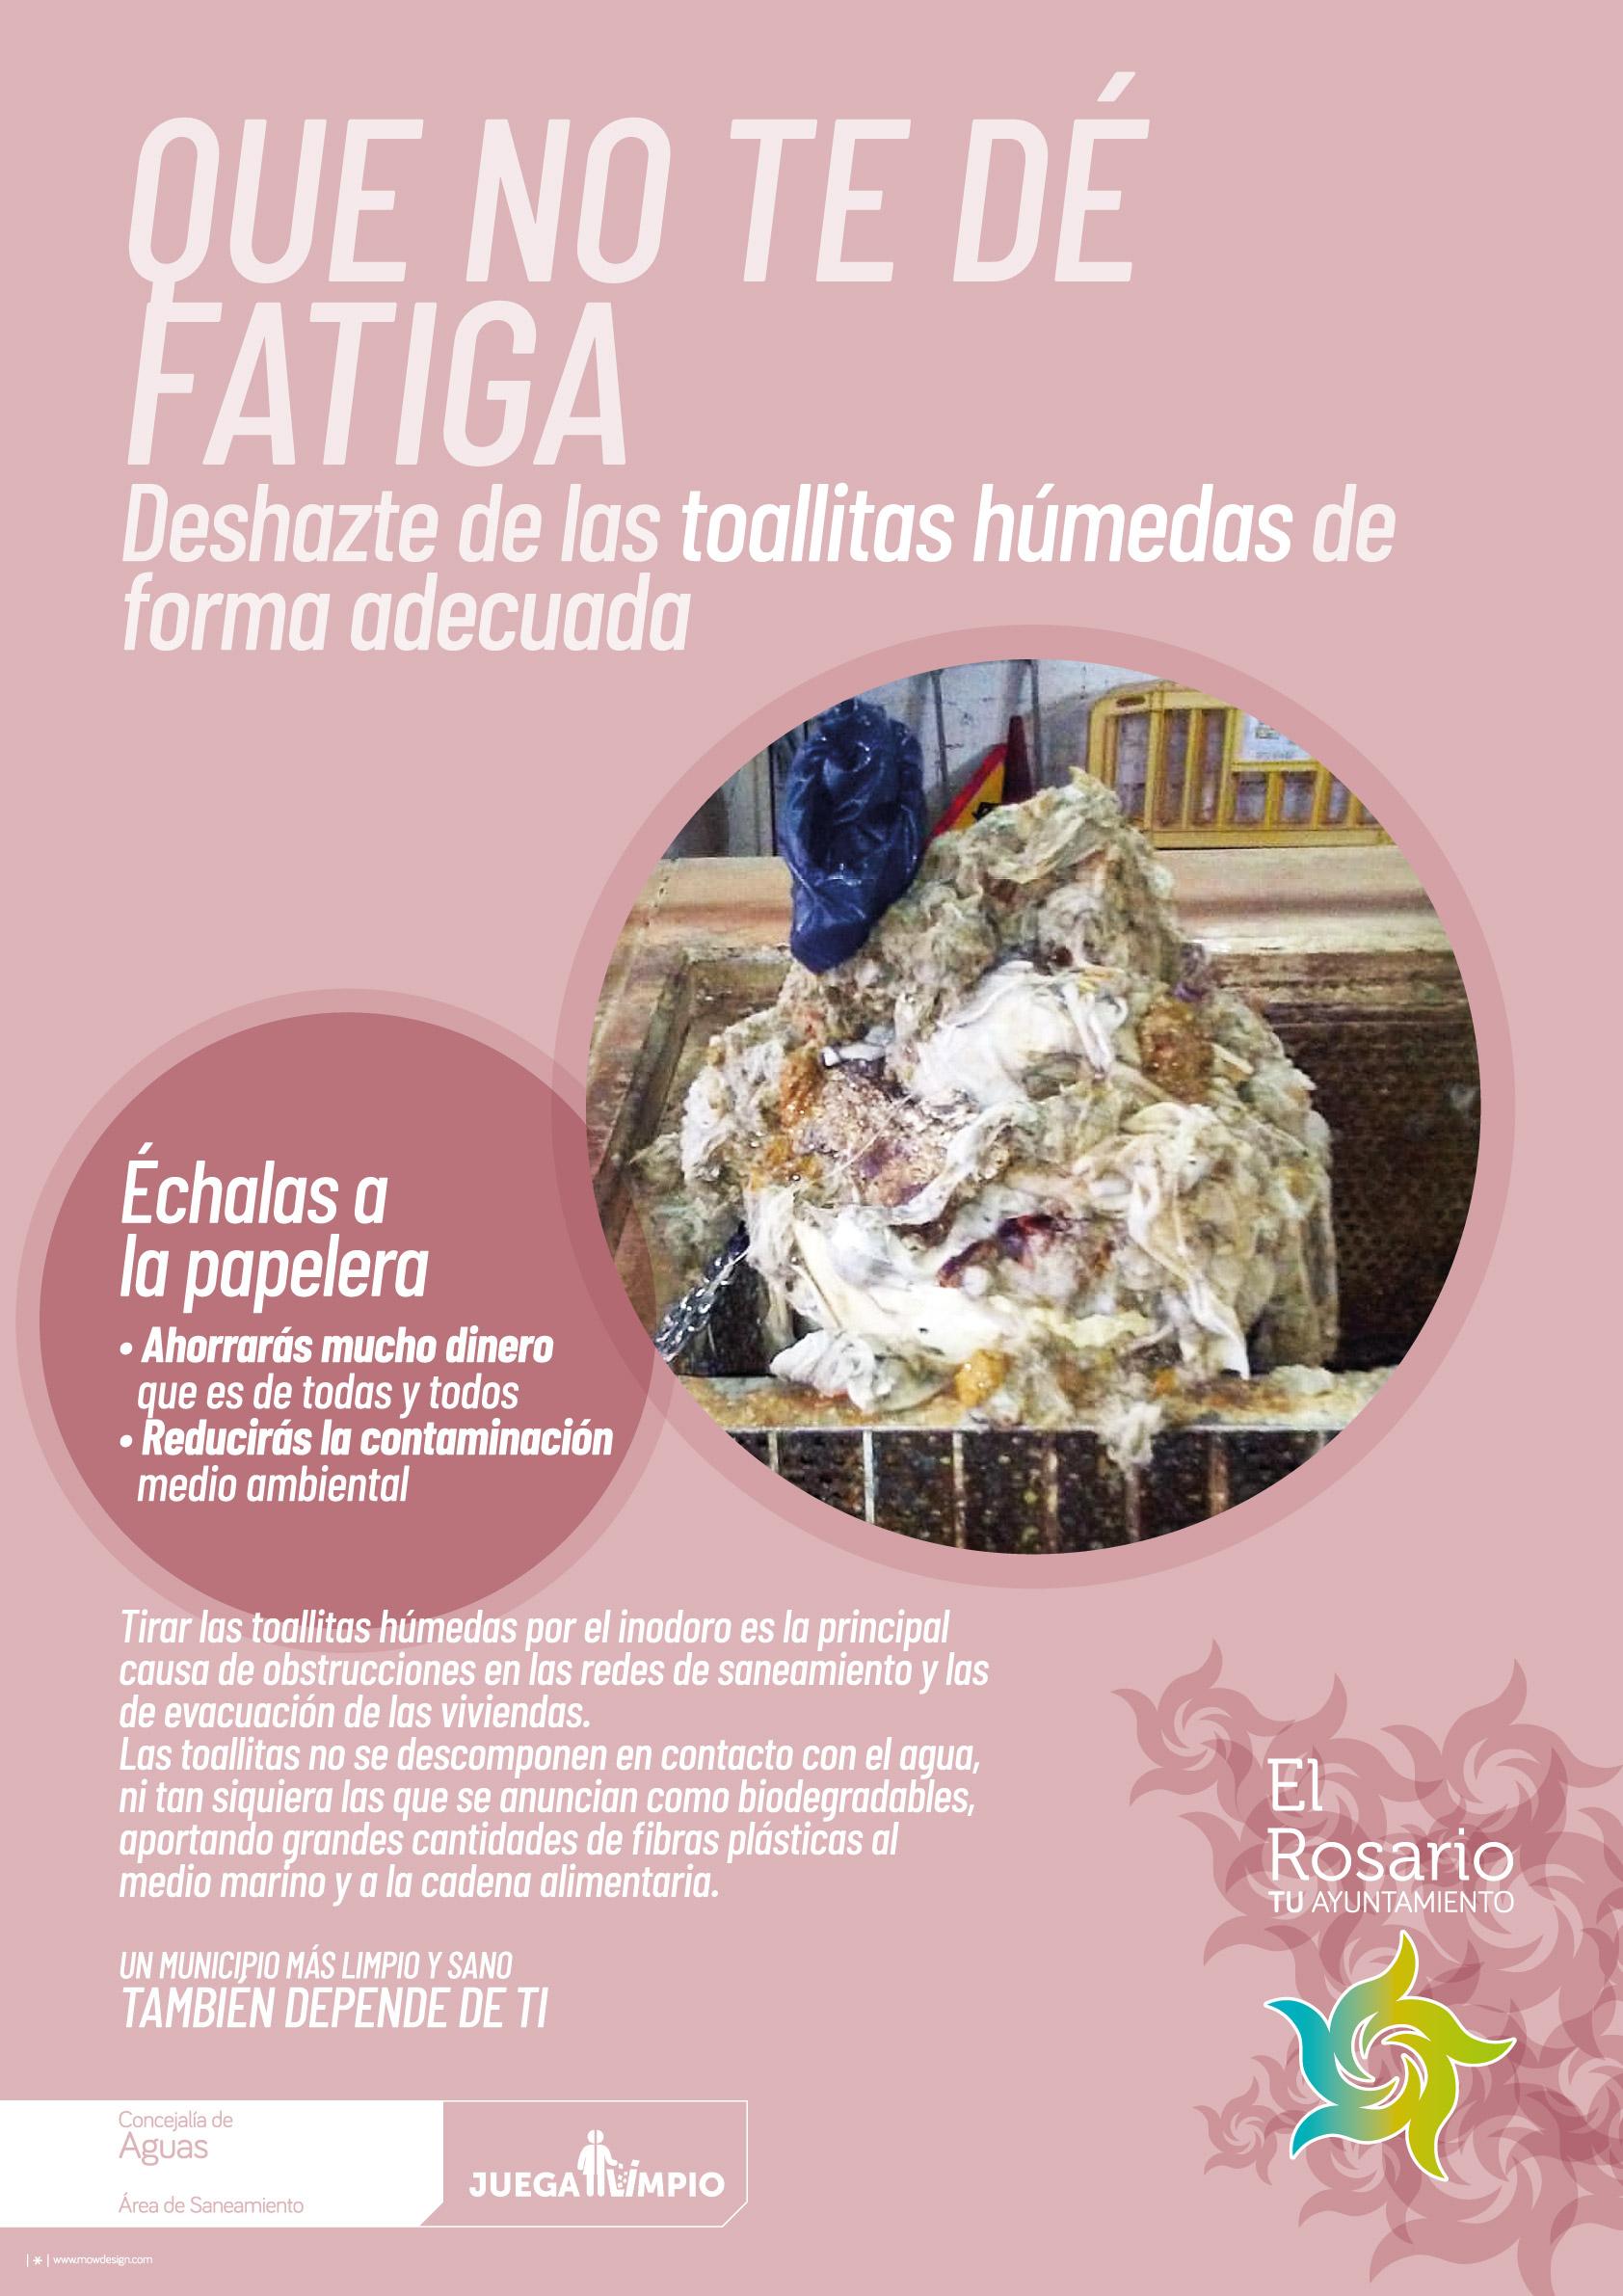 CAMPANIA-QUE_NO_TE_DE_FATIGA-TOALLITAS-20190000-CARTEL_a3-20190324-01af-redes